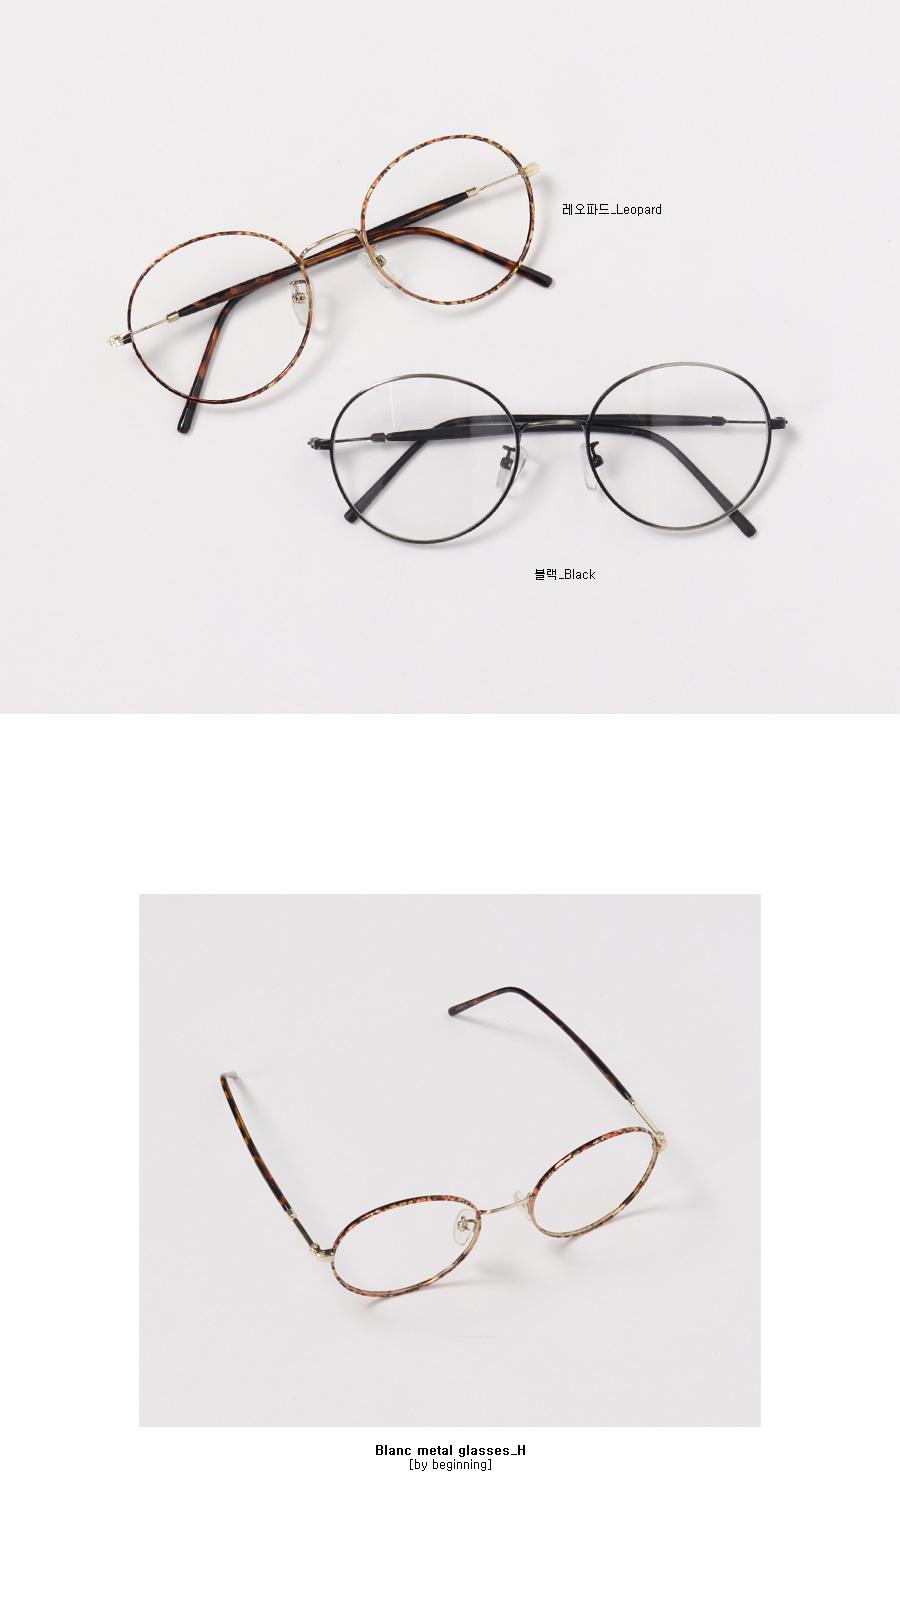 Blanc metal glasses_H (size : one)